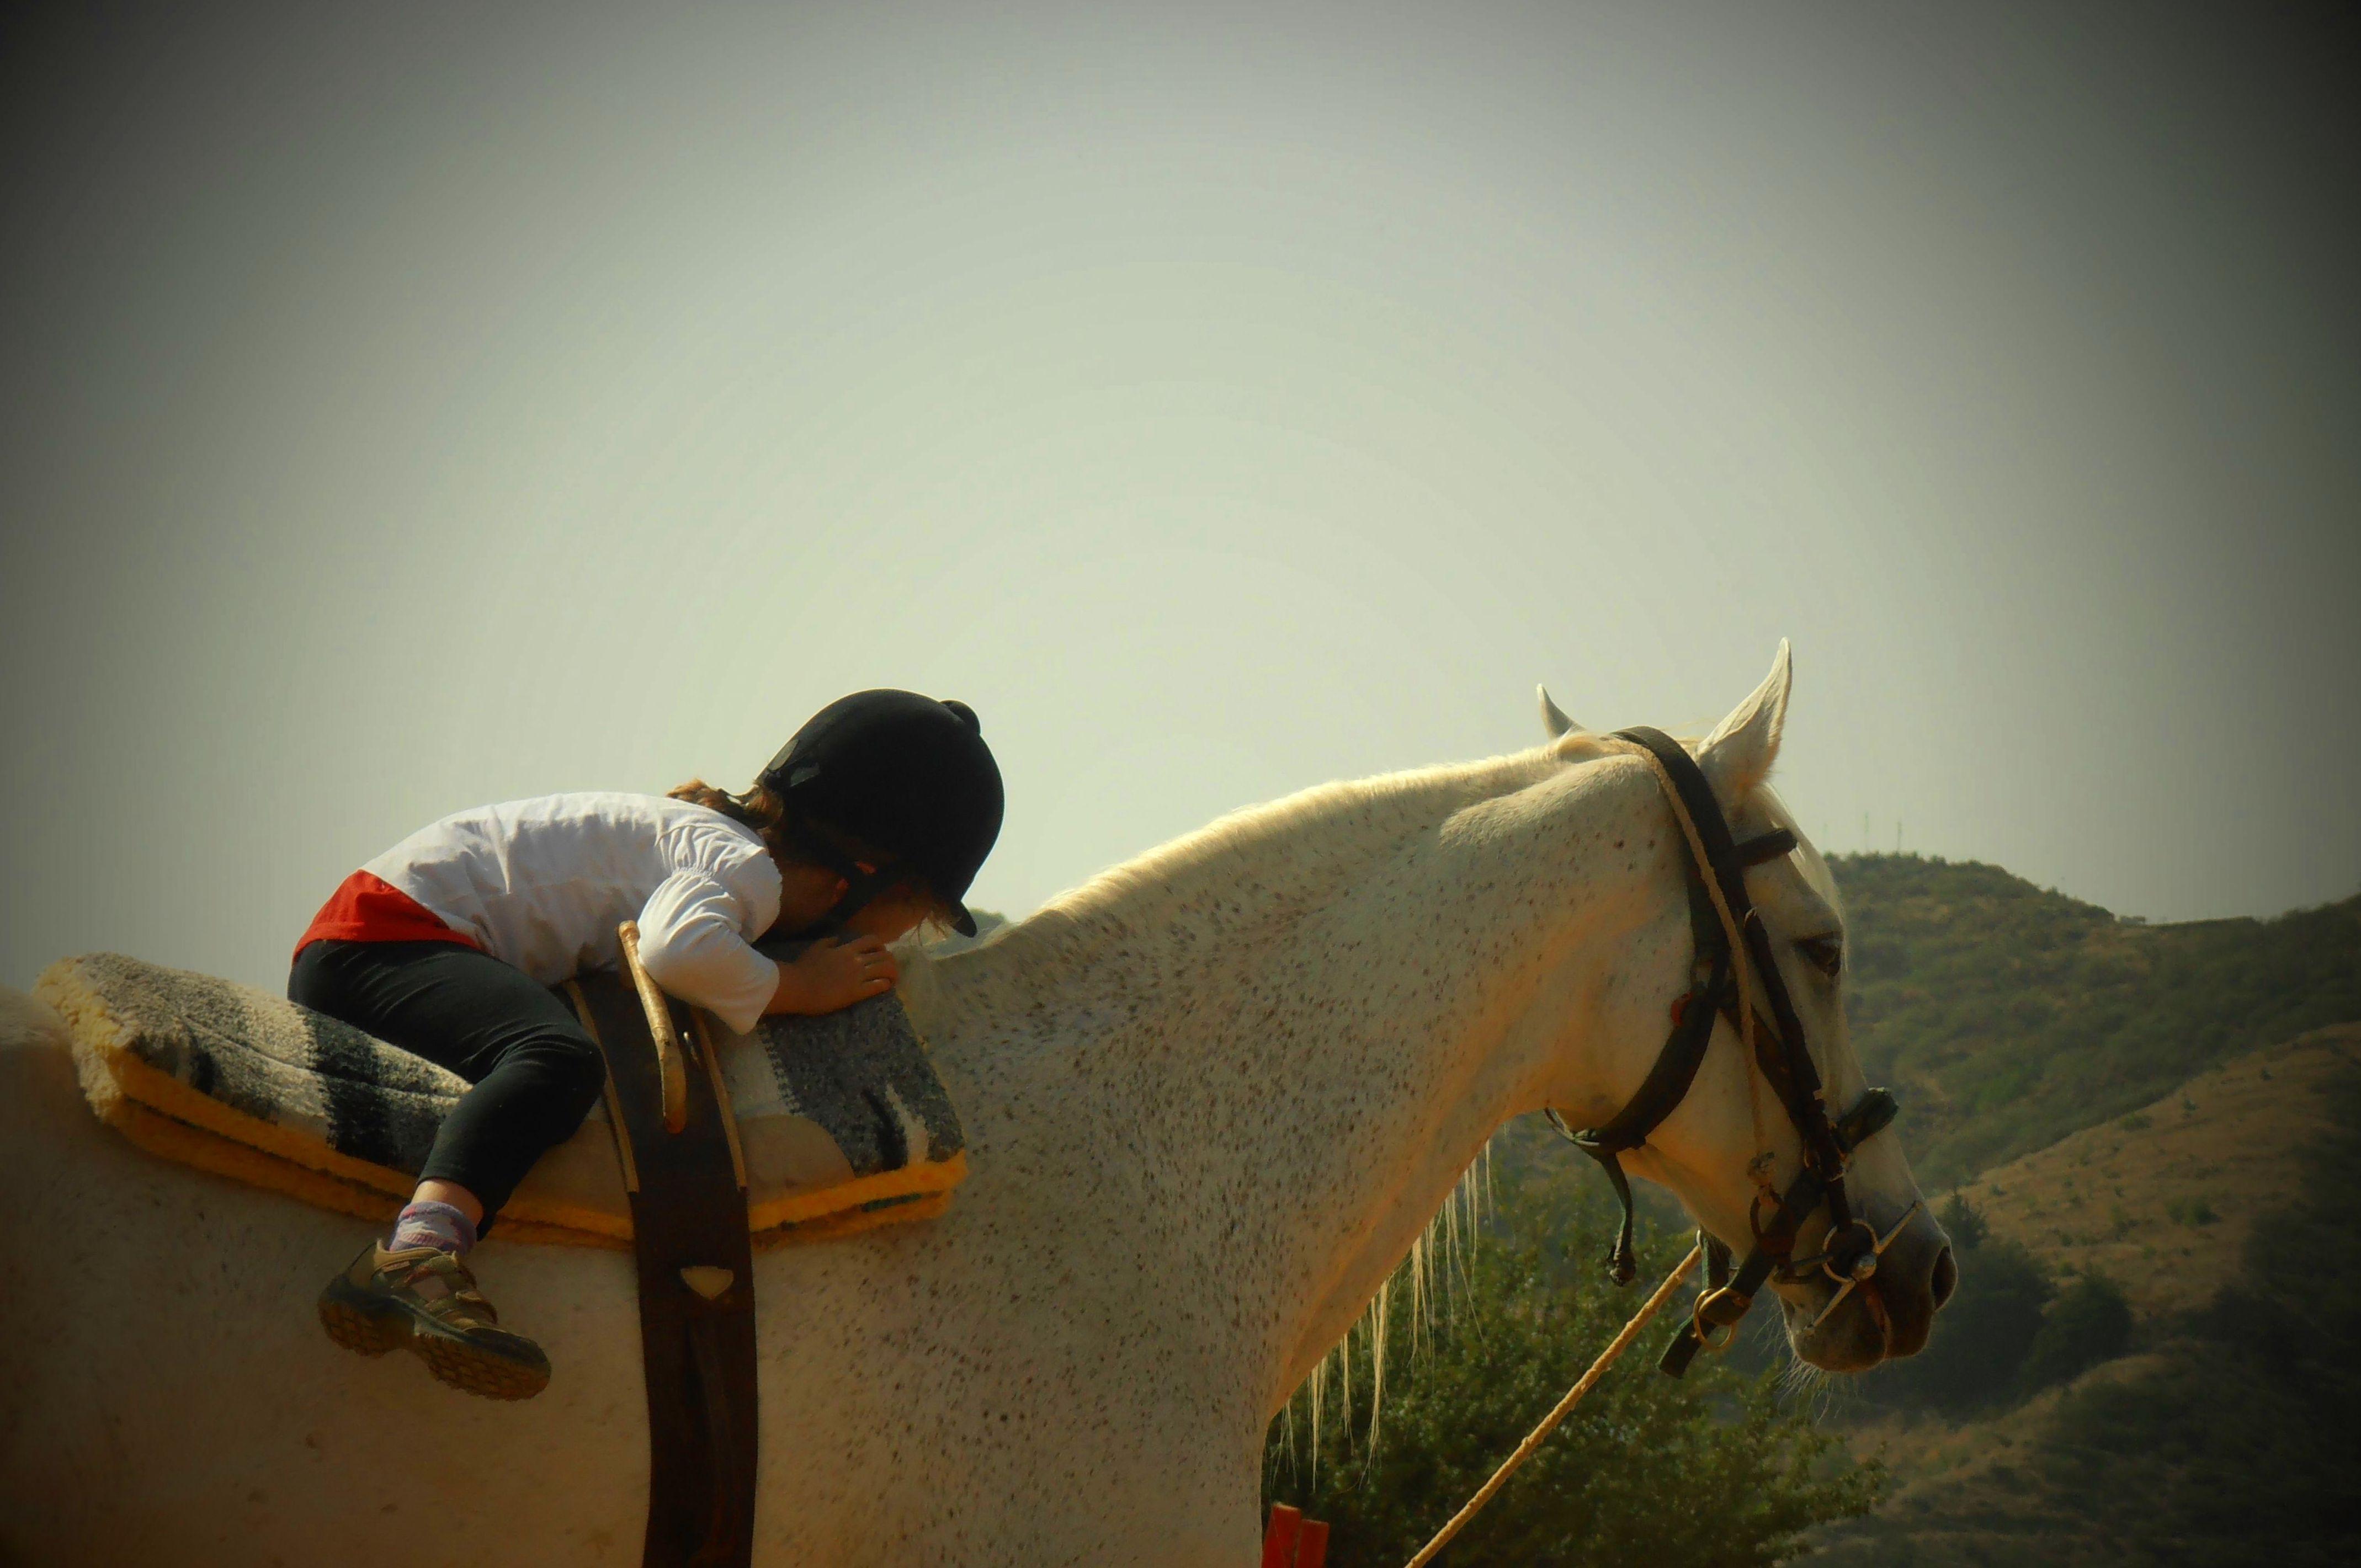 Intervenciones asistidas con caballos (IAC): Servicios de Centro Hípico San Mateo